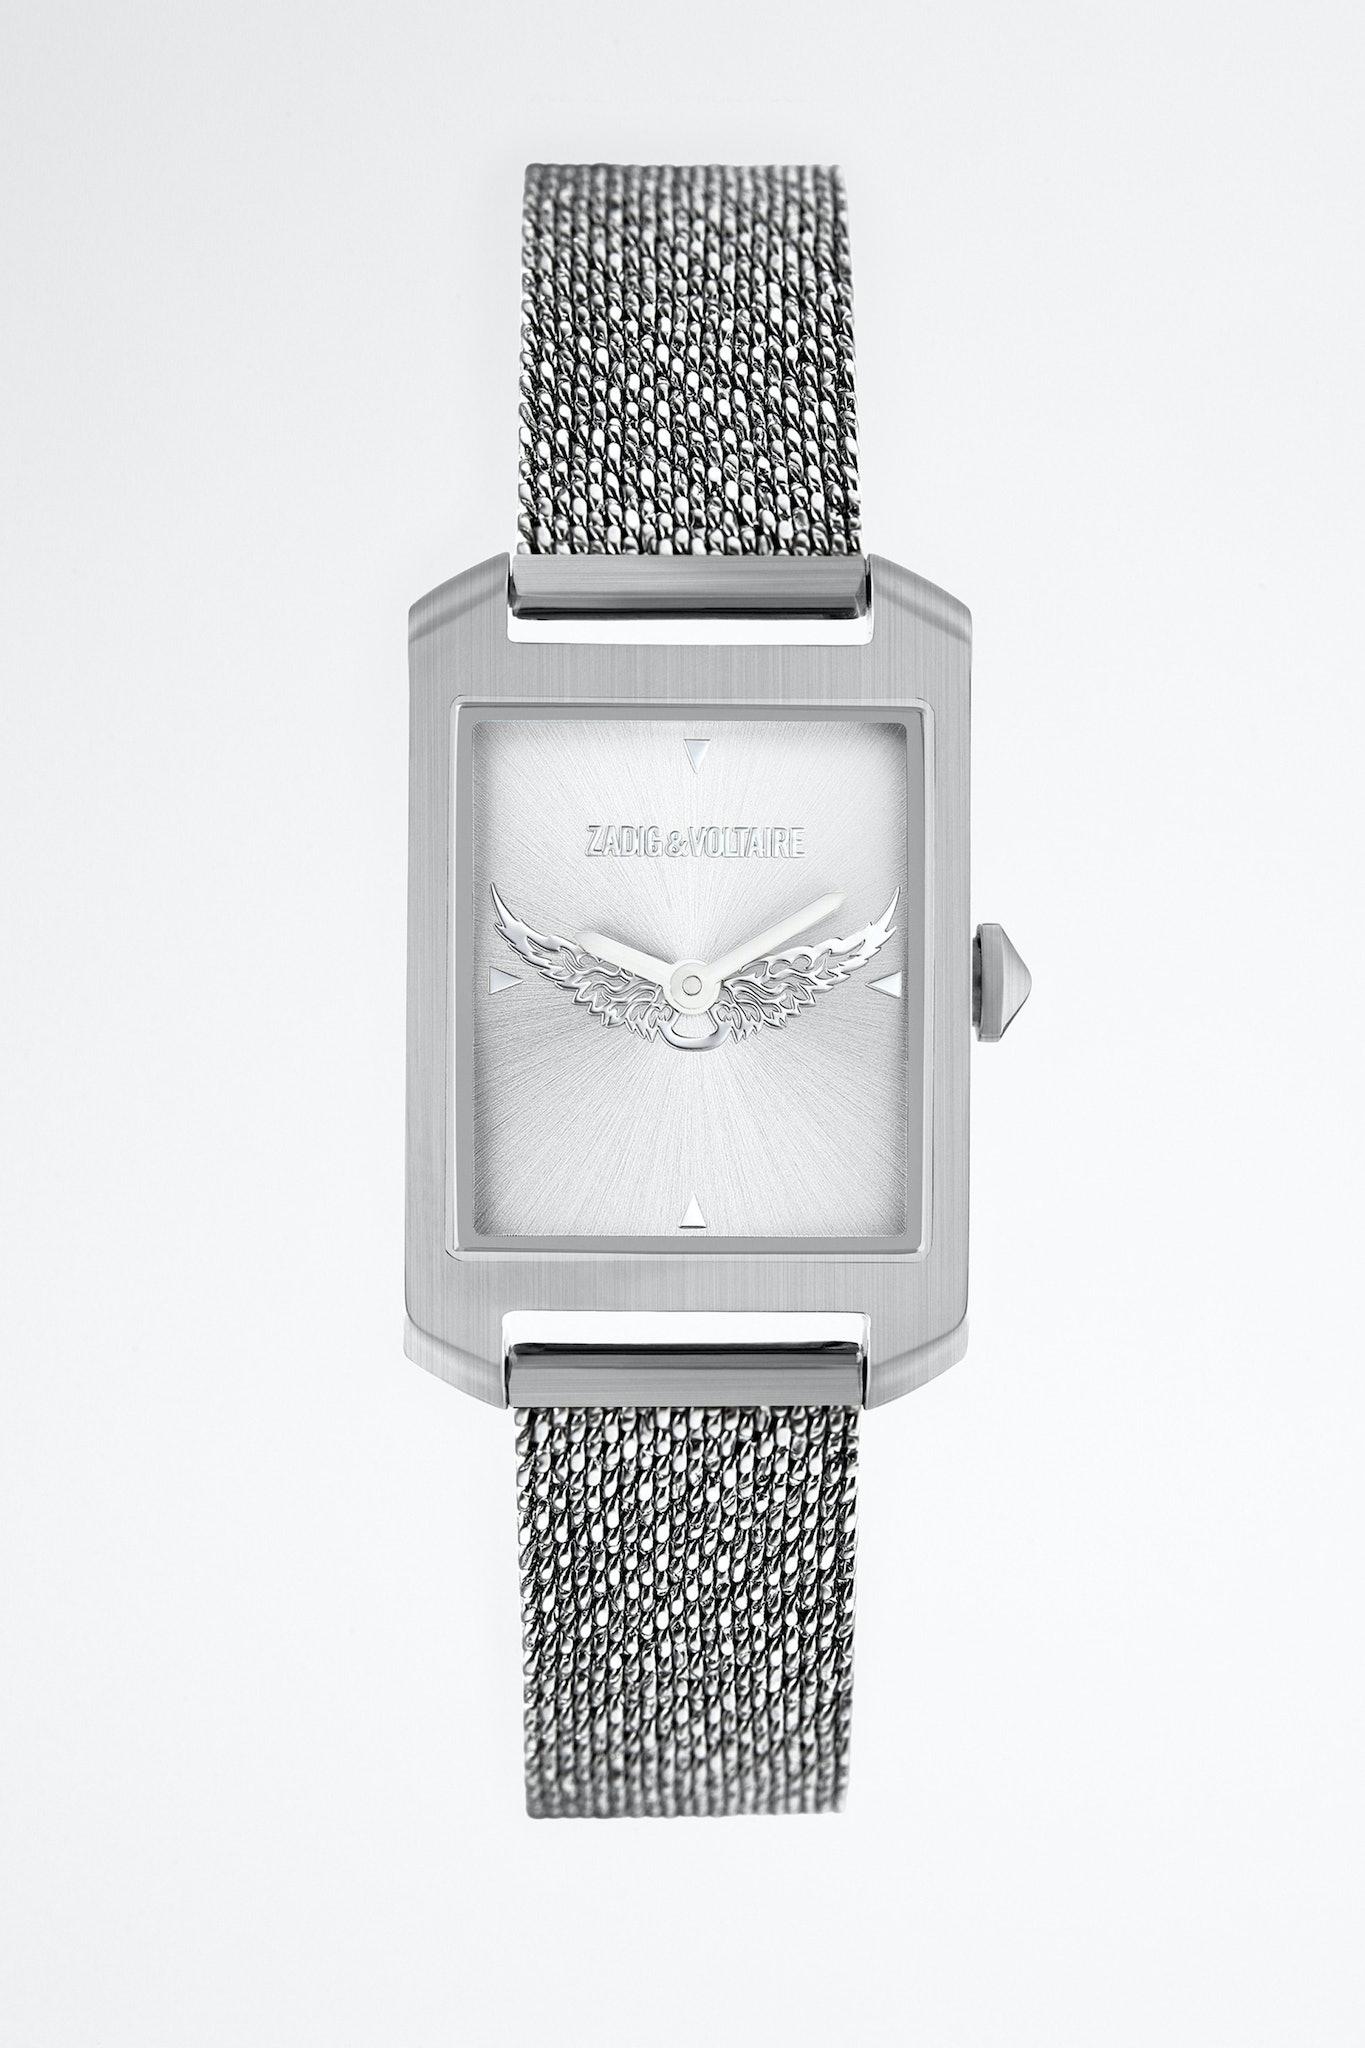 Uhr Timeline Metal mit Flügelmotiv